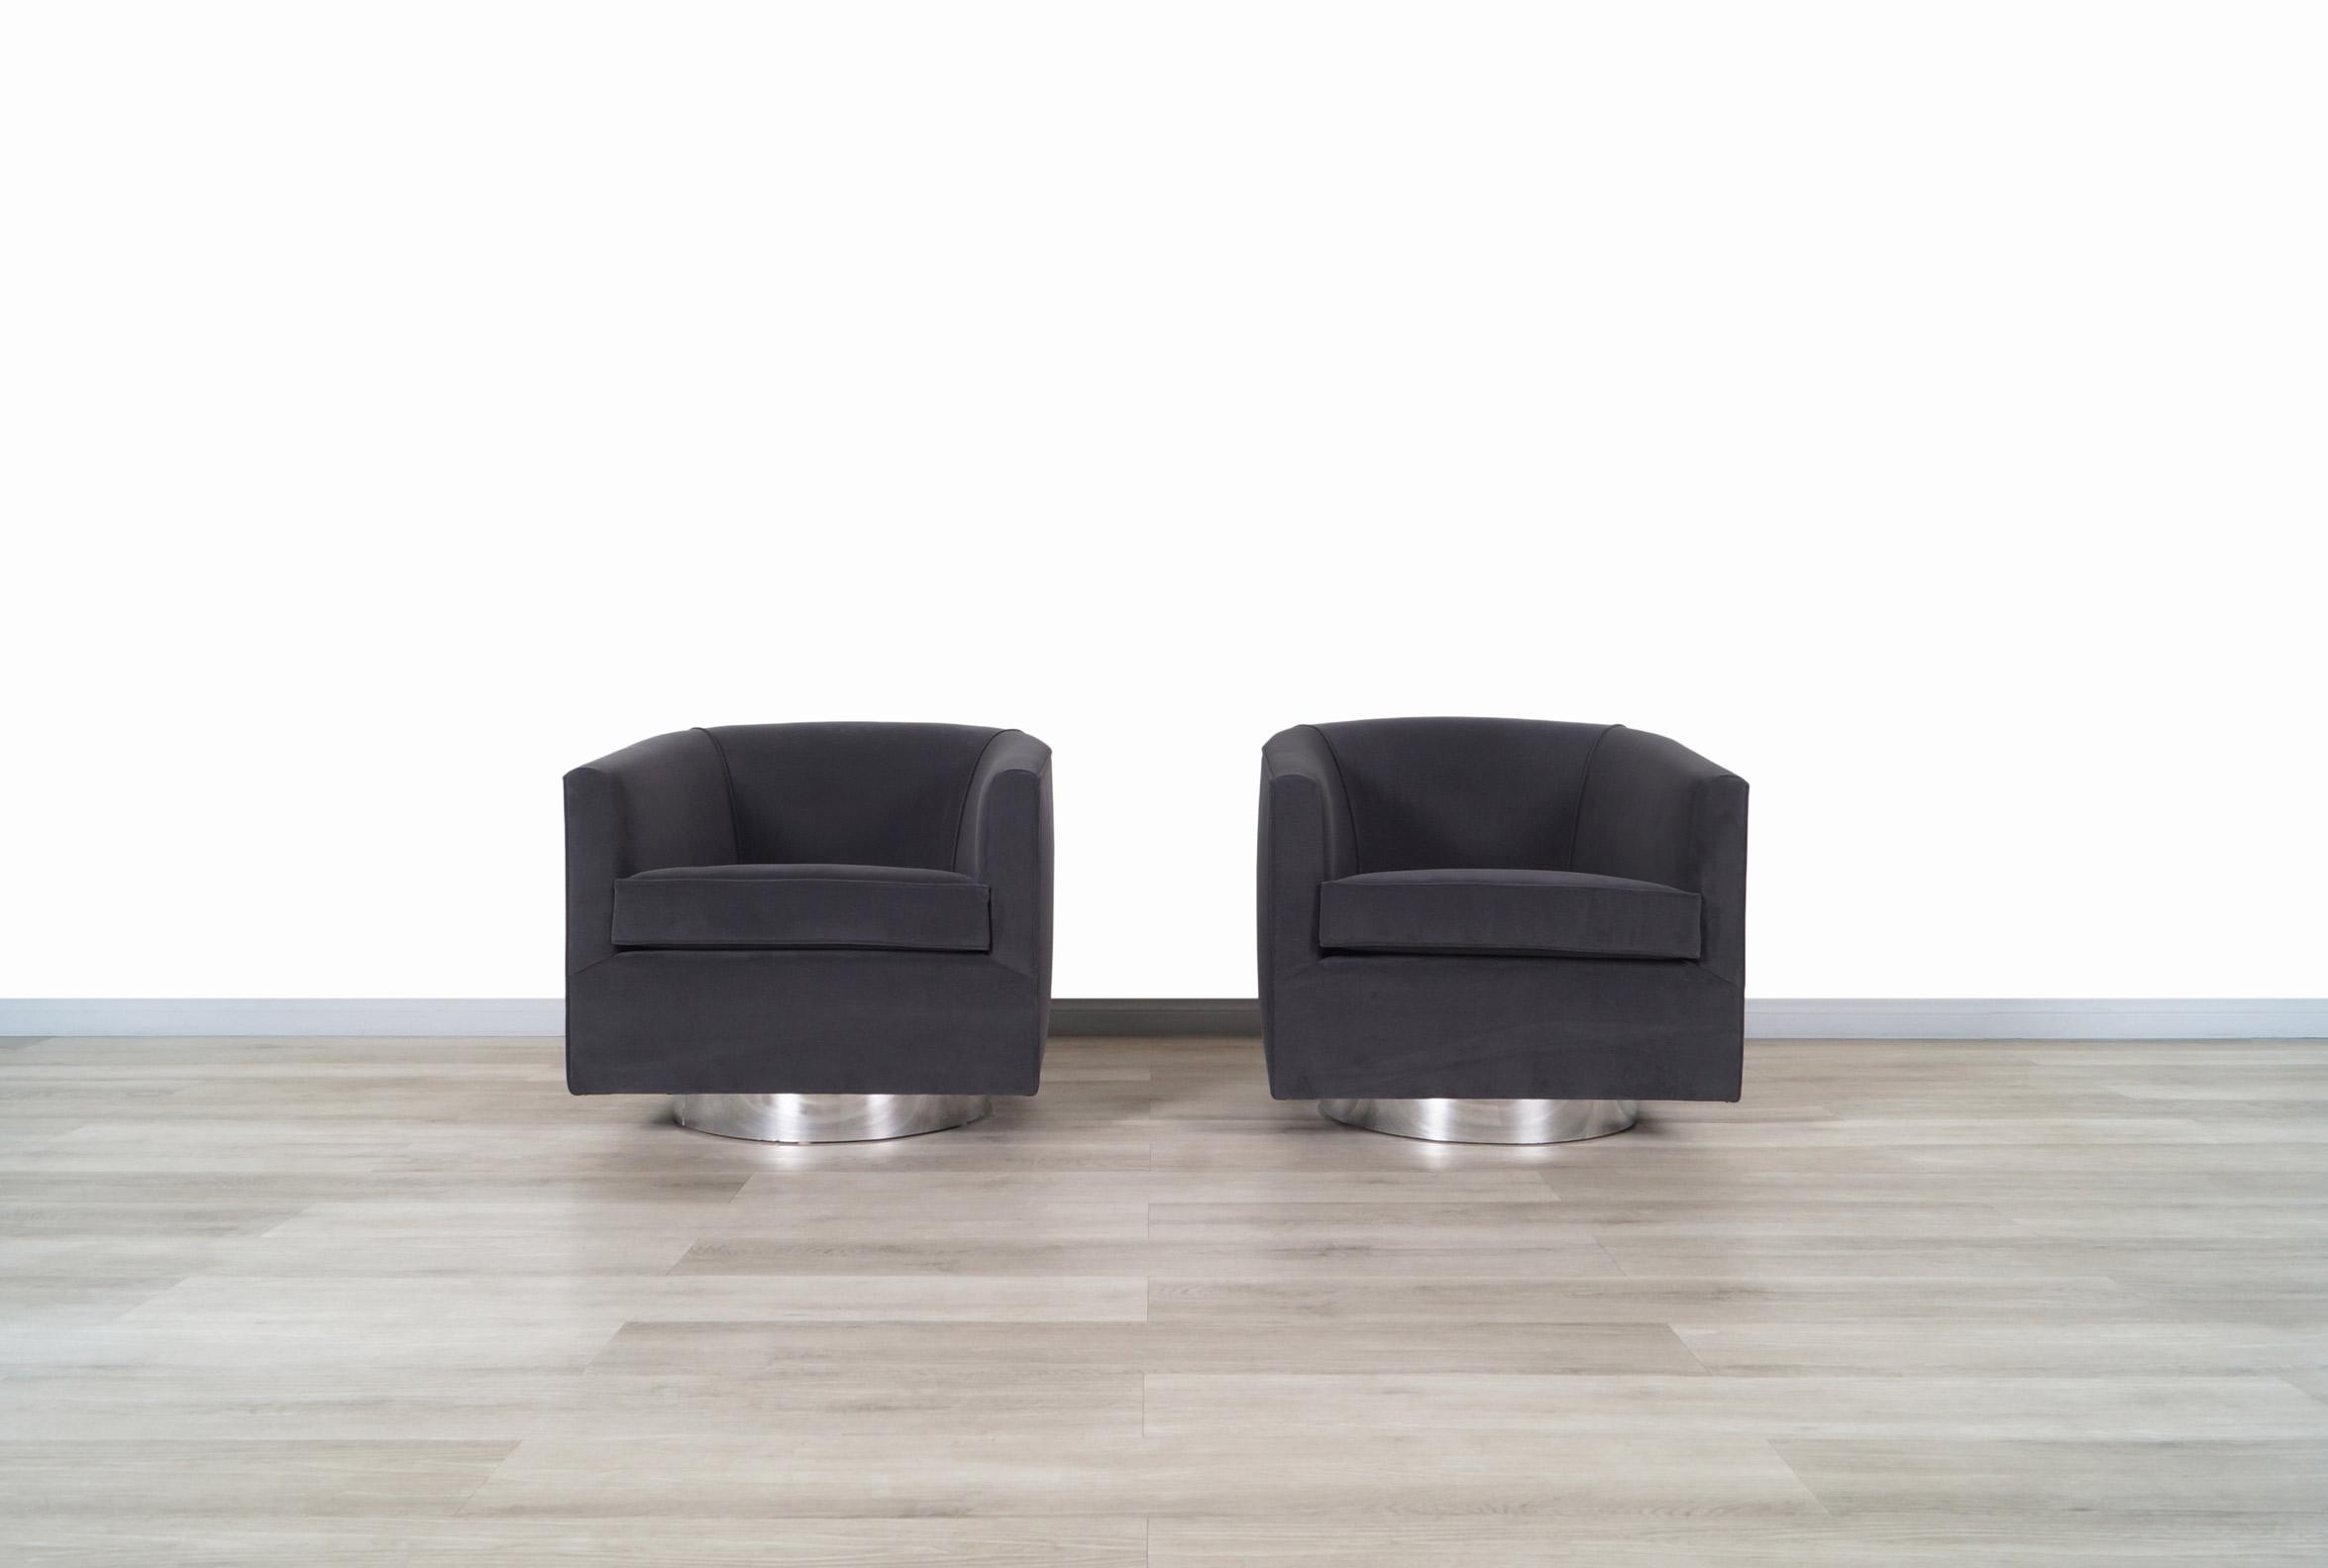 Vintage Chrome Swivel Lounge Chairs by Milo Baughman